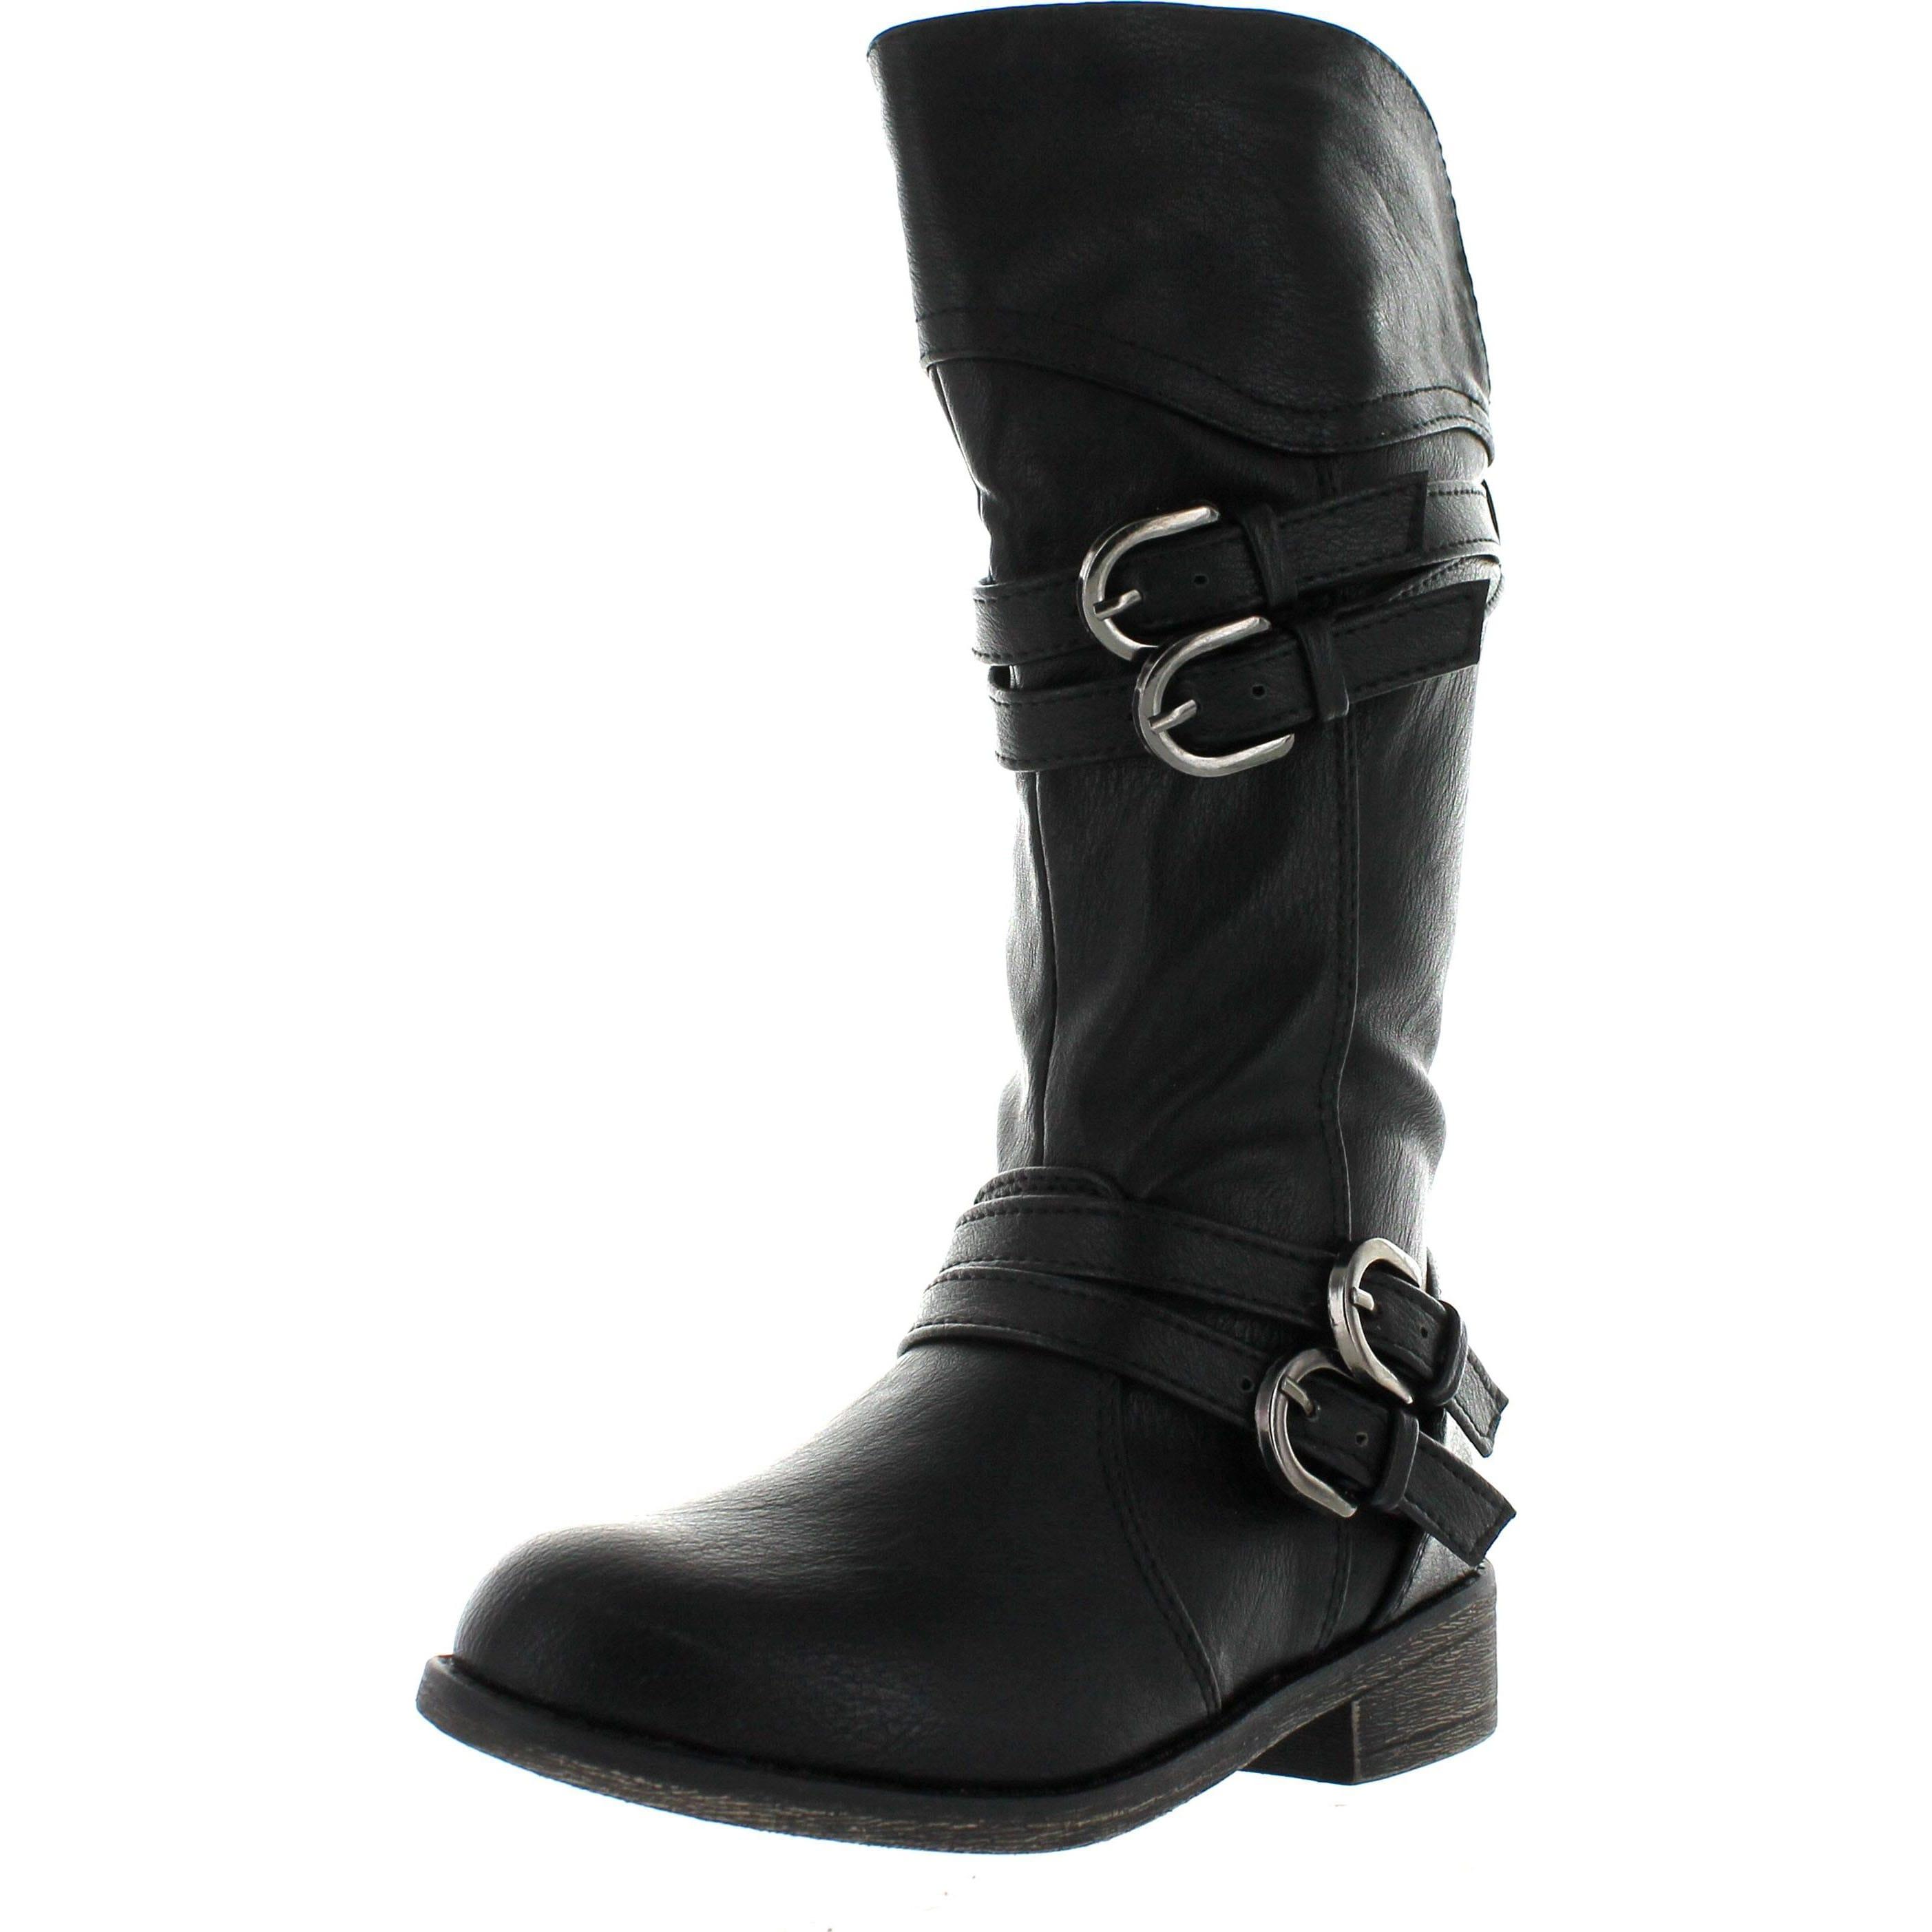 d1834b276f8 Lucky Top Fay-42K Children Girl s Classical Block Heel Buckle Knee High  Riding Boots